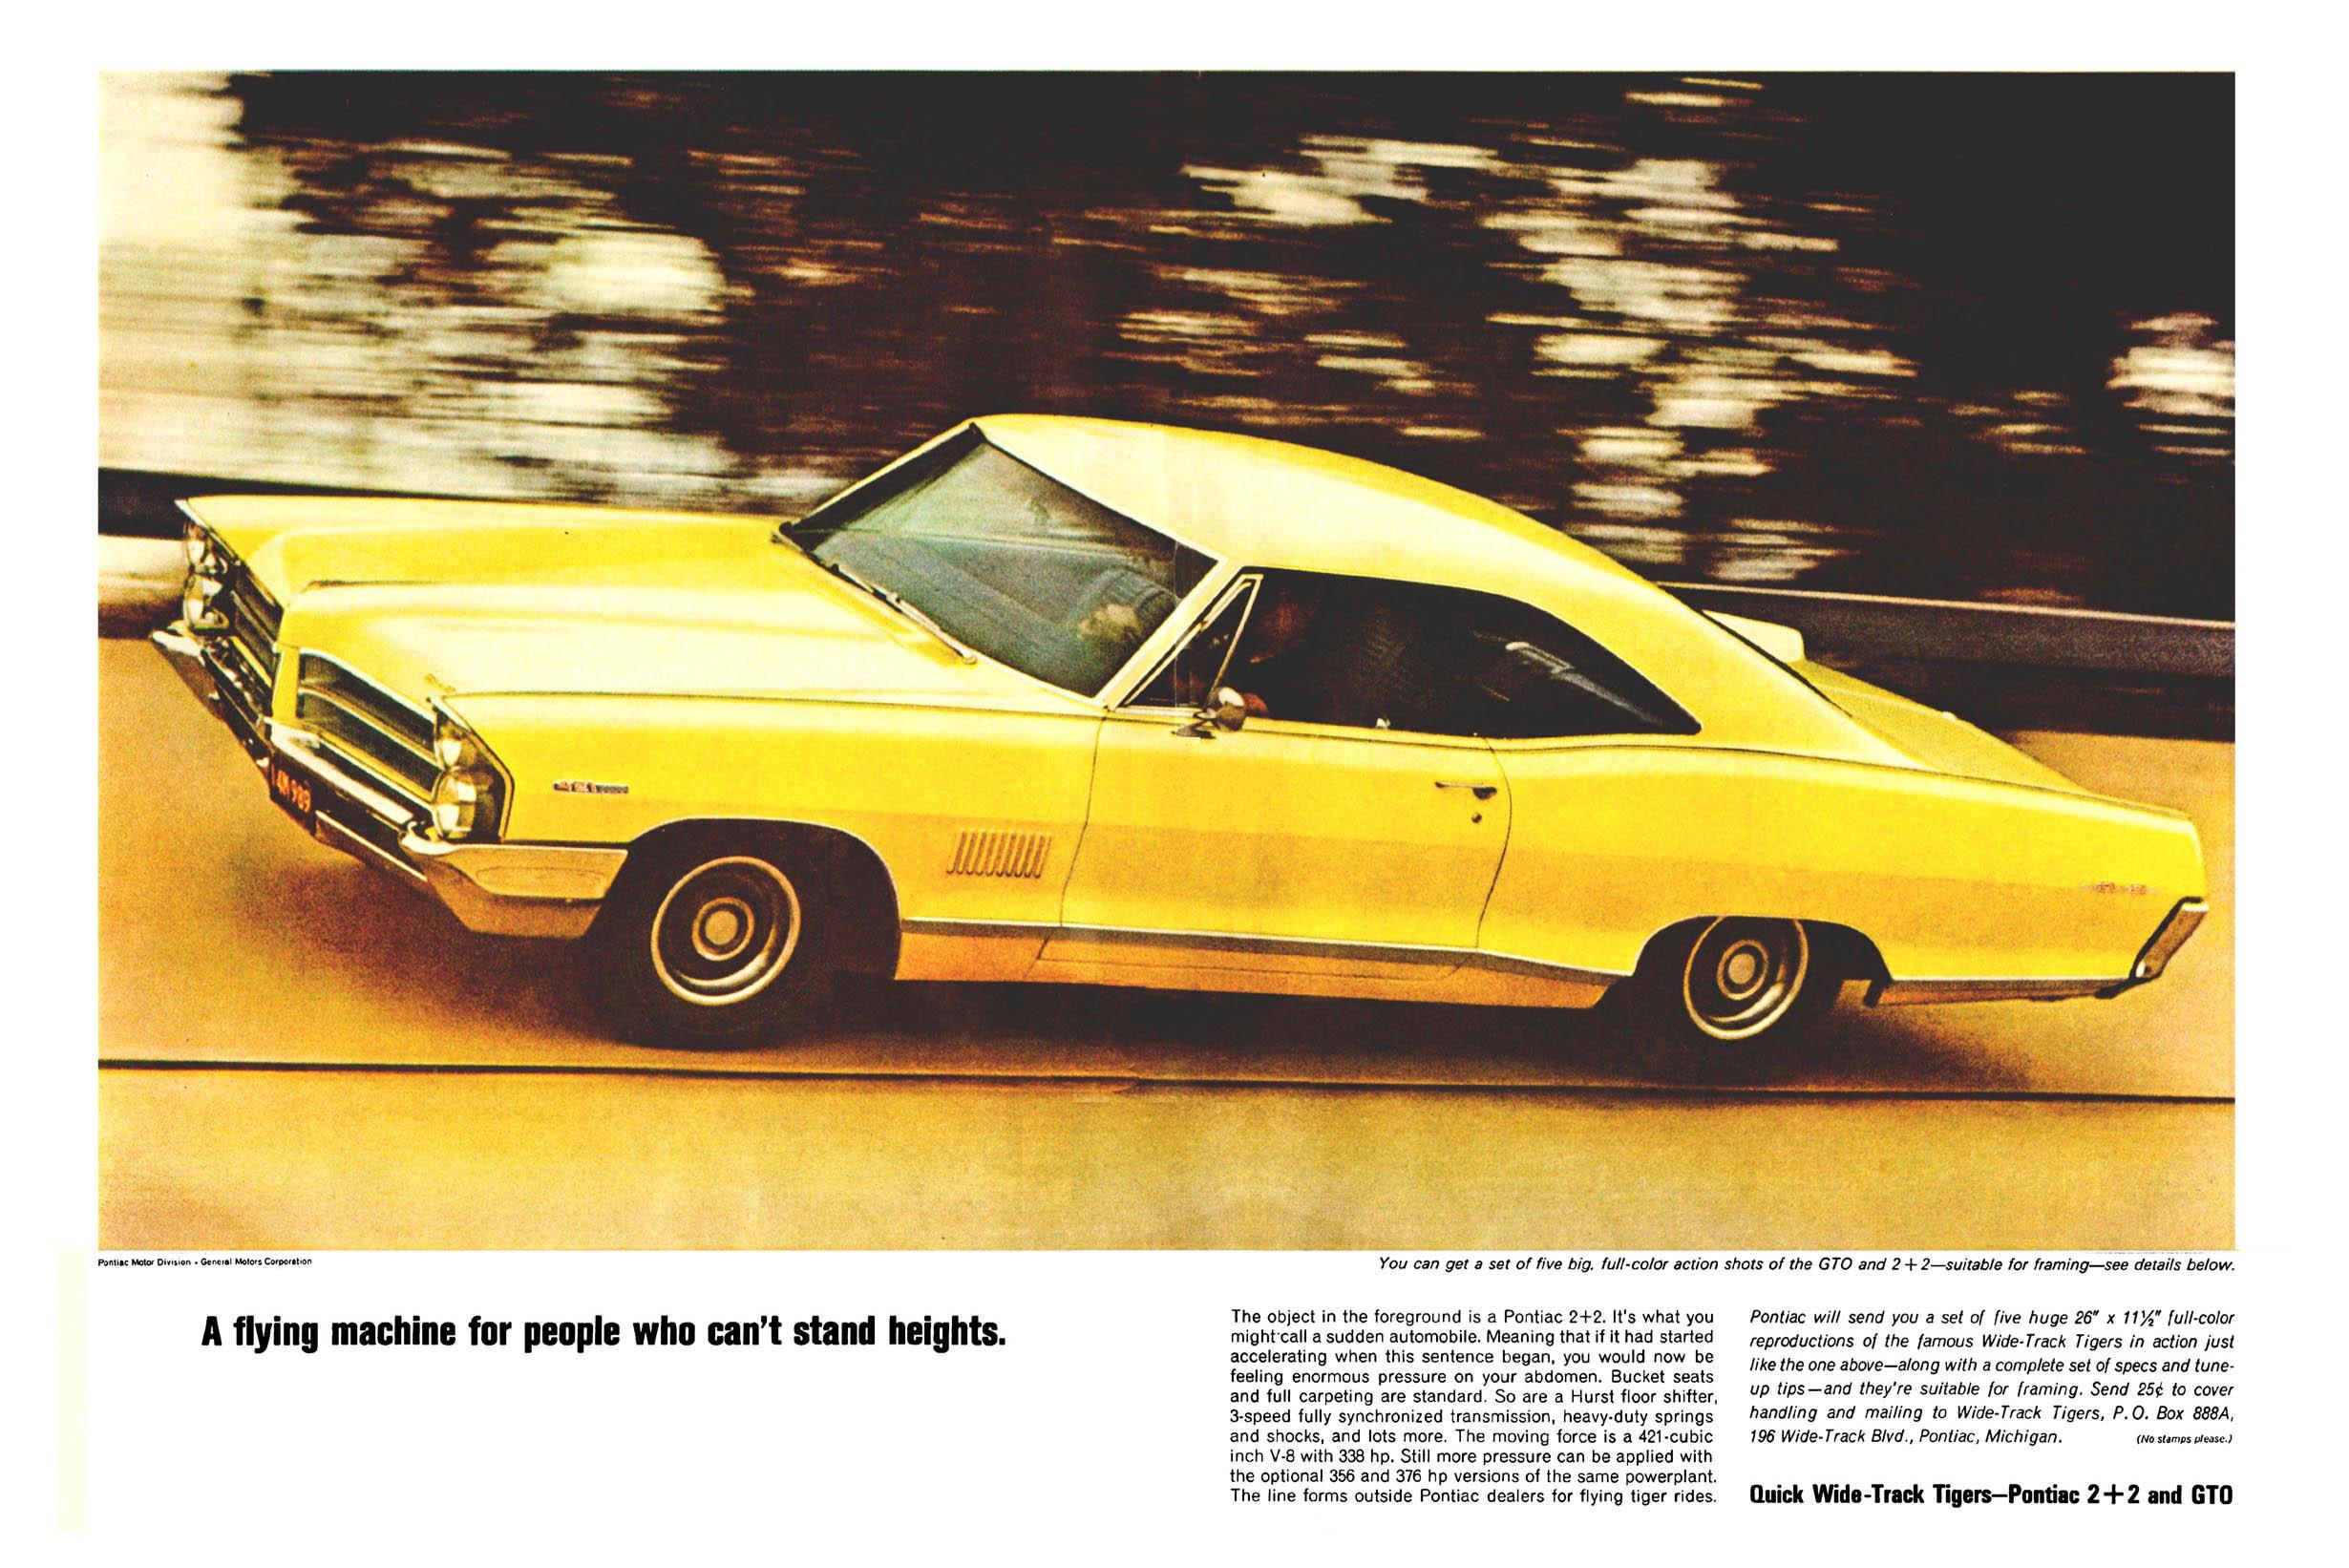 Pontiac 2+2 Ad yellow